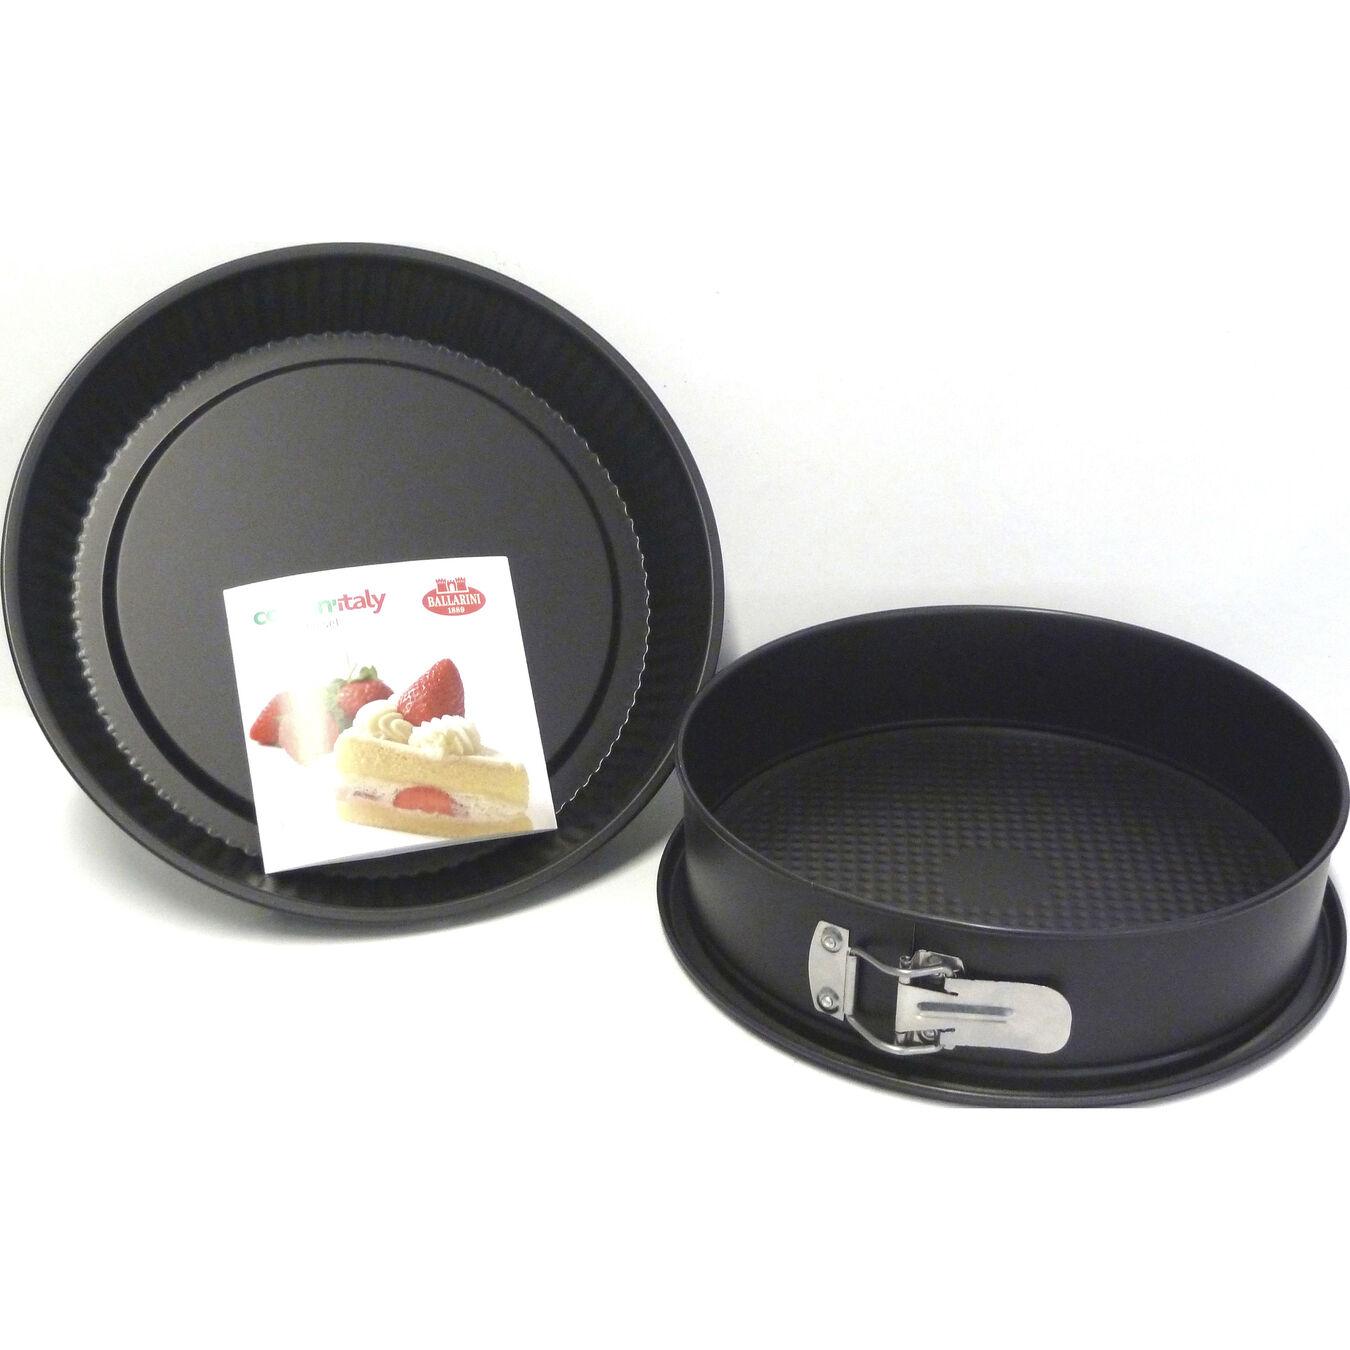 2 Piece round Bakeware set, black,,large 1